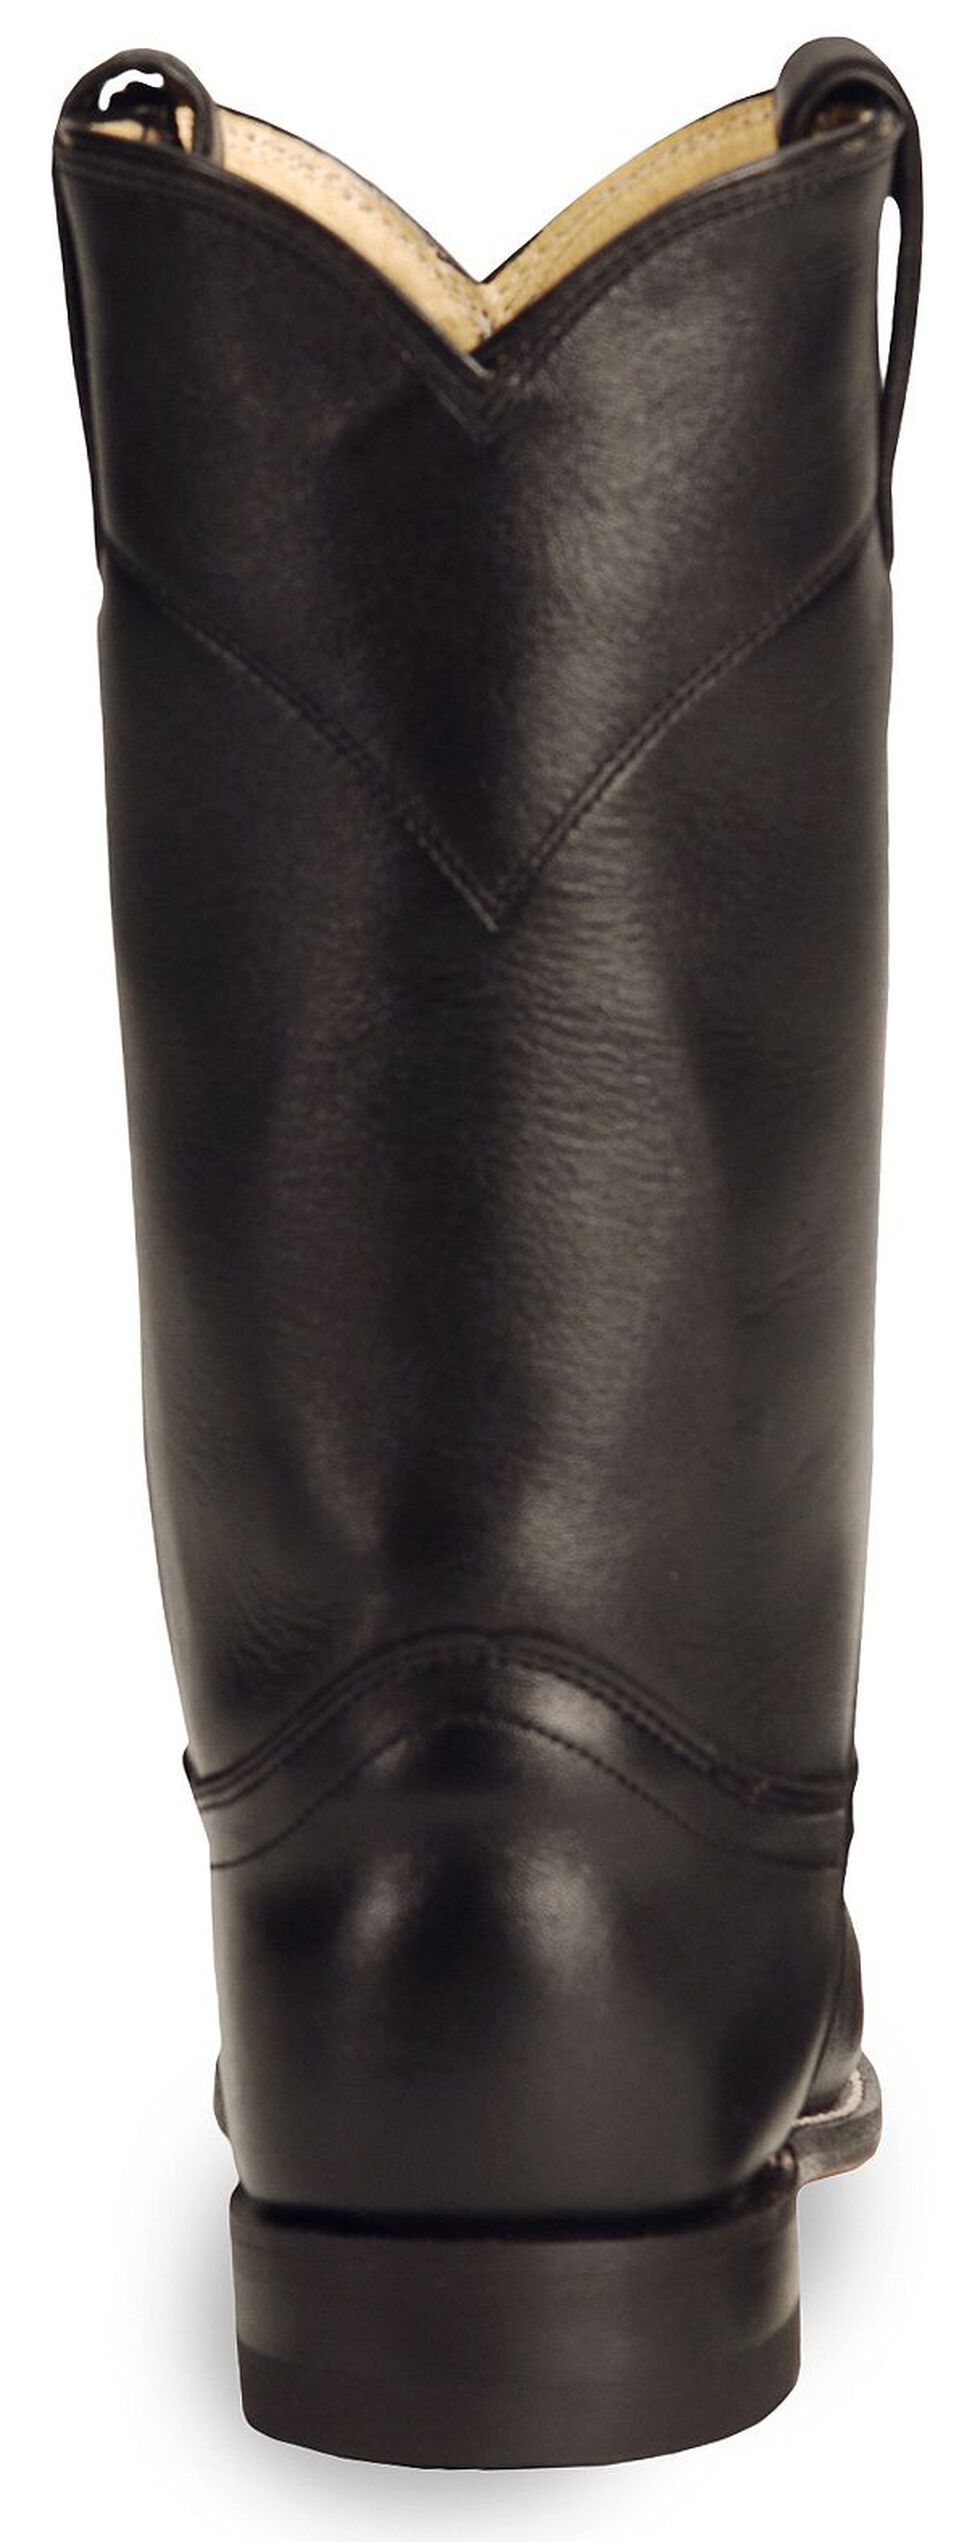 Justin Women's Original Black Roper Boots - Round Toe, Black, hi-res